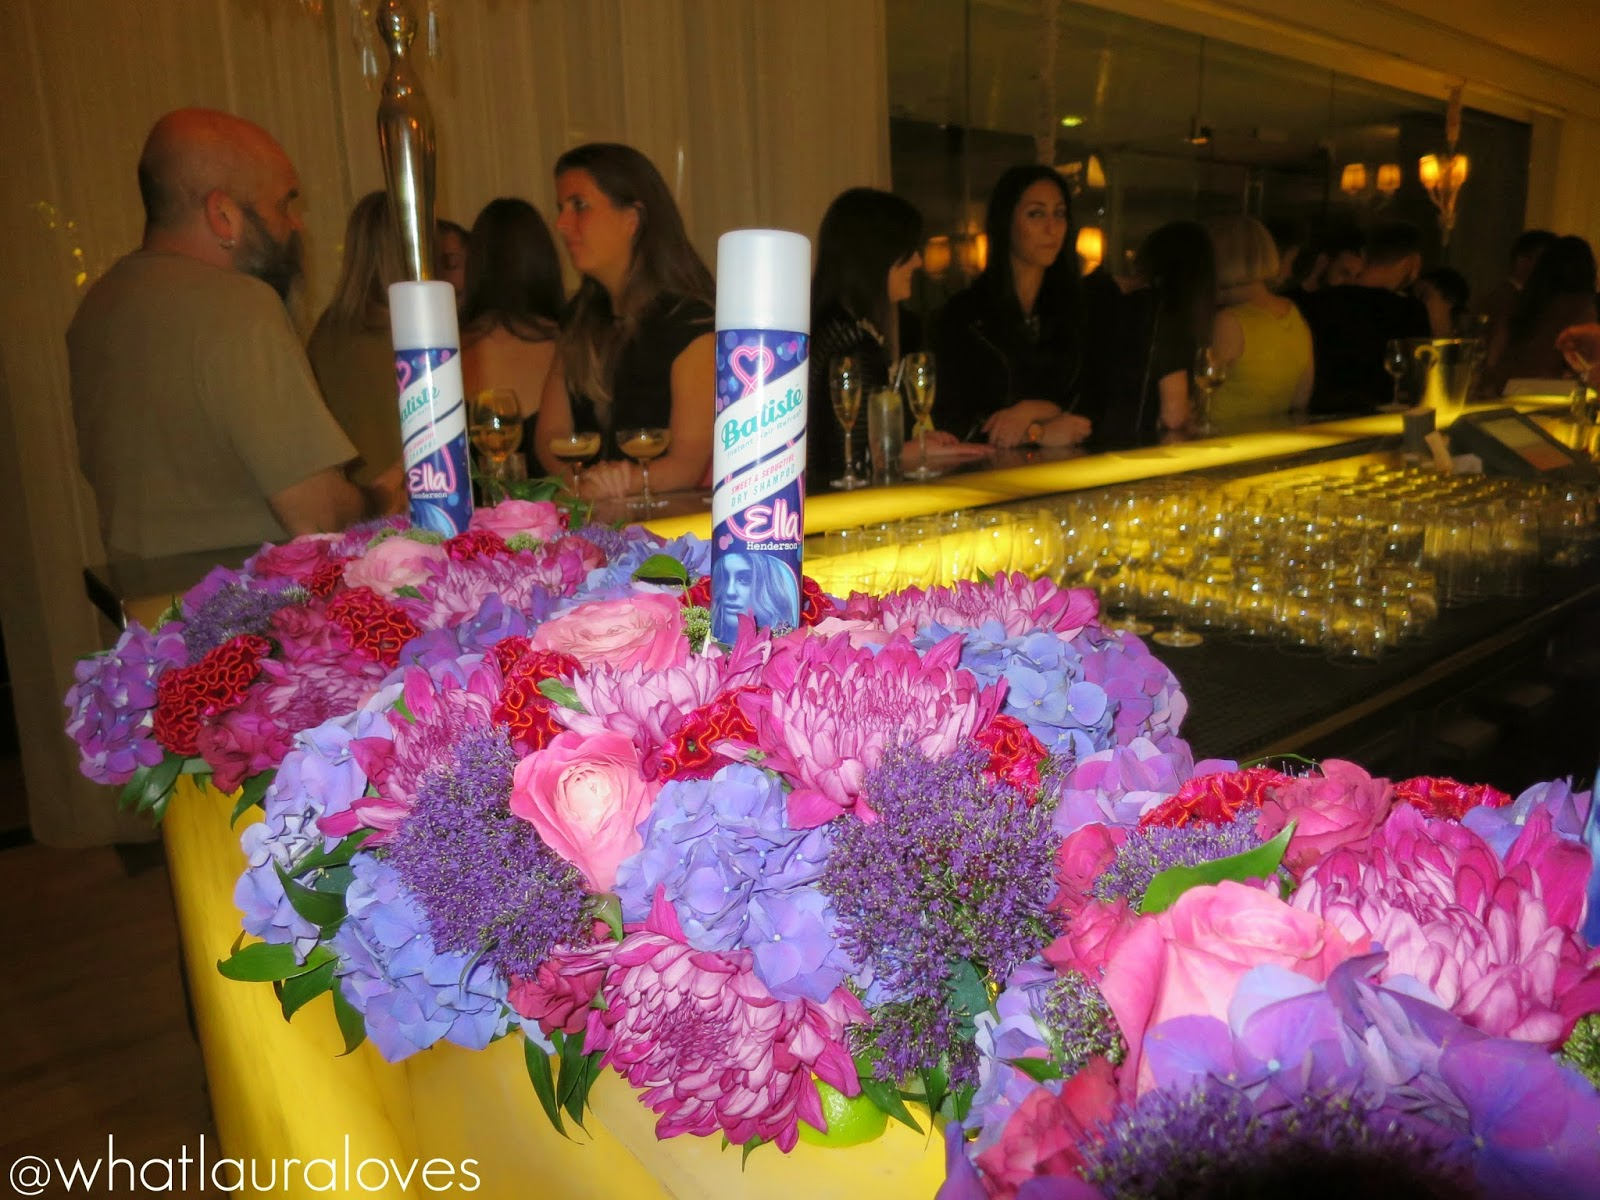 Ella Henderson Batiste Dry Shampoo